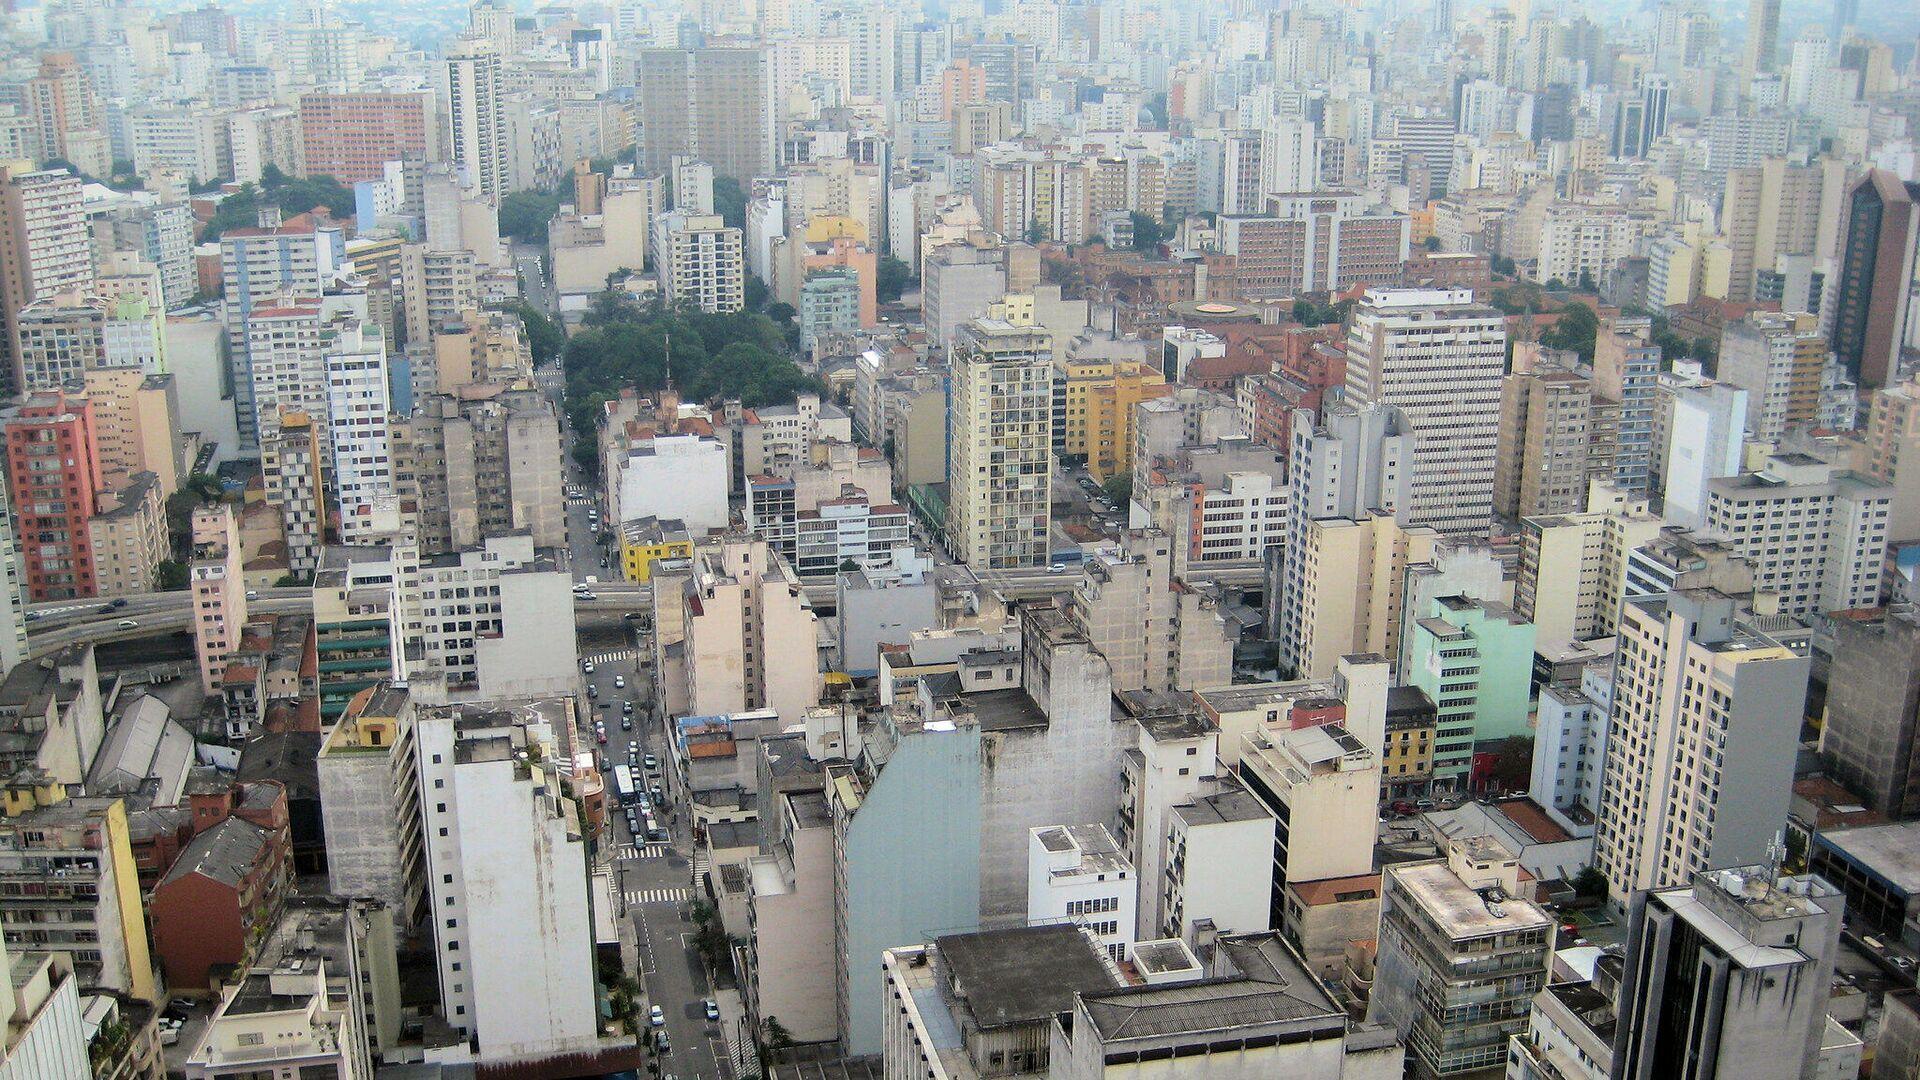 Vista de la ciudad de Sao Paulo, Brasil - Sputnik Mundo, 1920, 17.05.2021